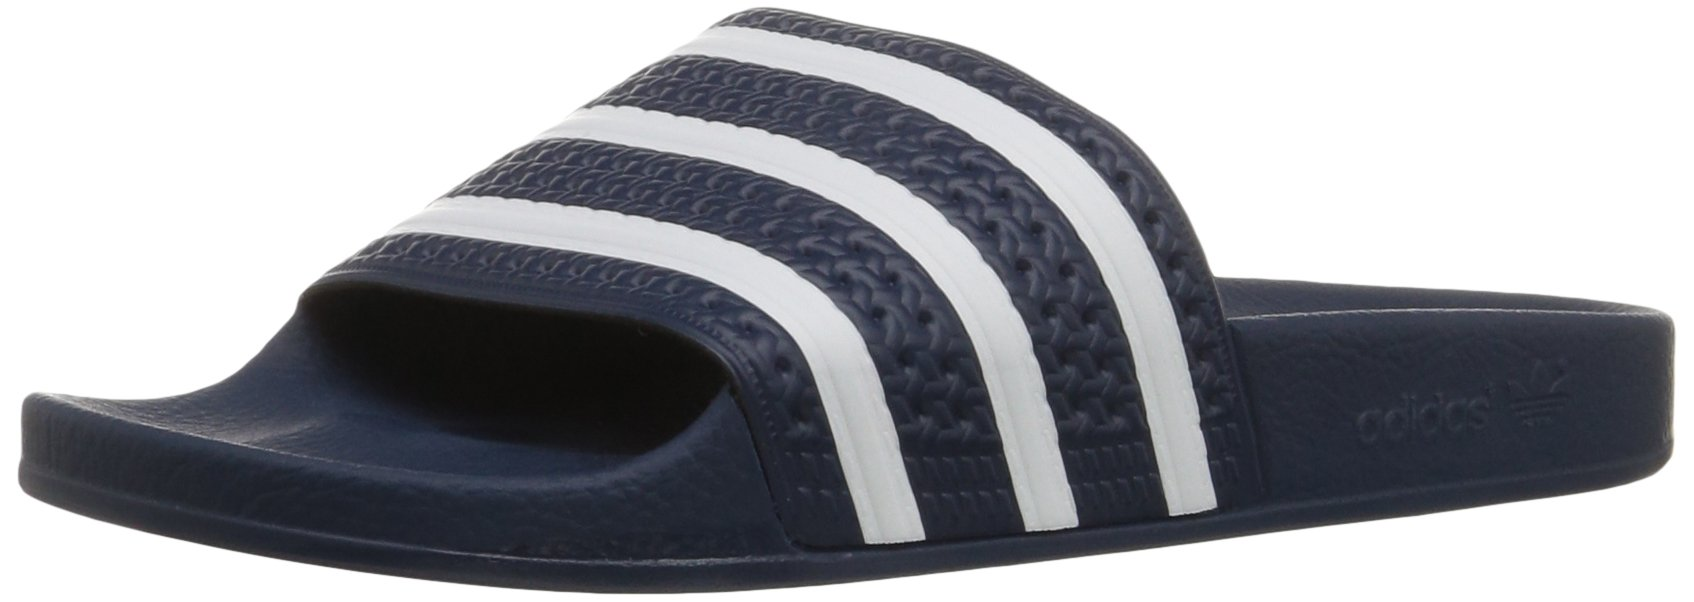 adidas Originals Men's Adilette Slide Sandals, White/Adidas Blue, ((9 M US) by adidas Originals